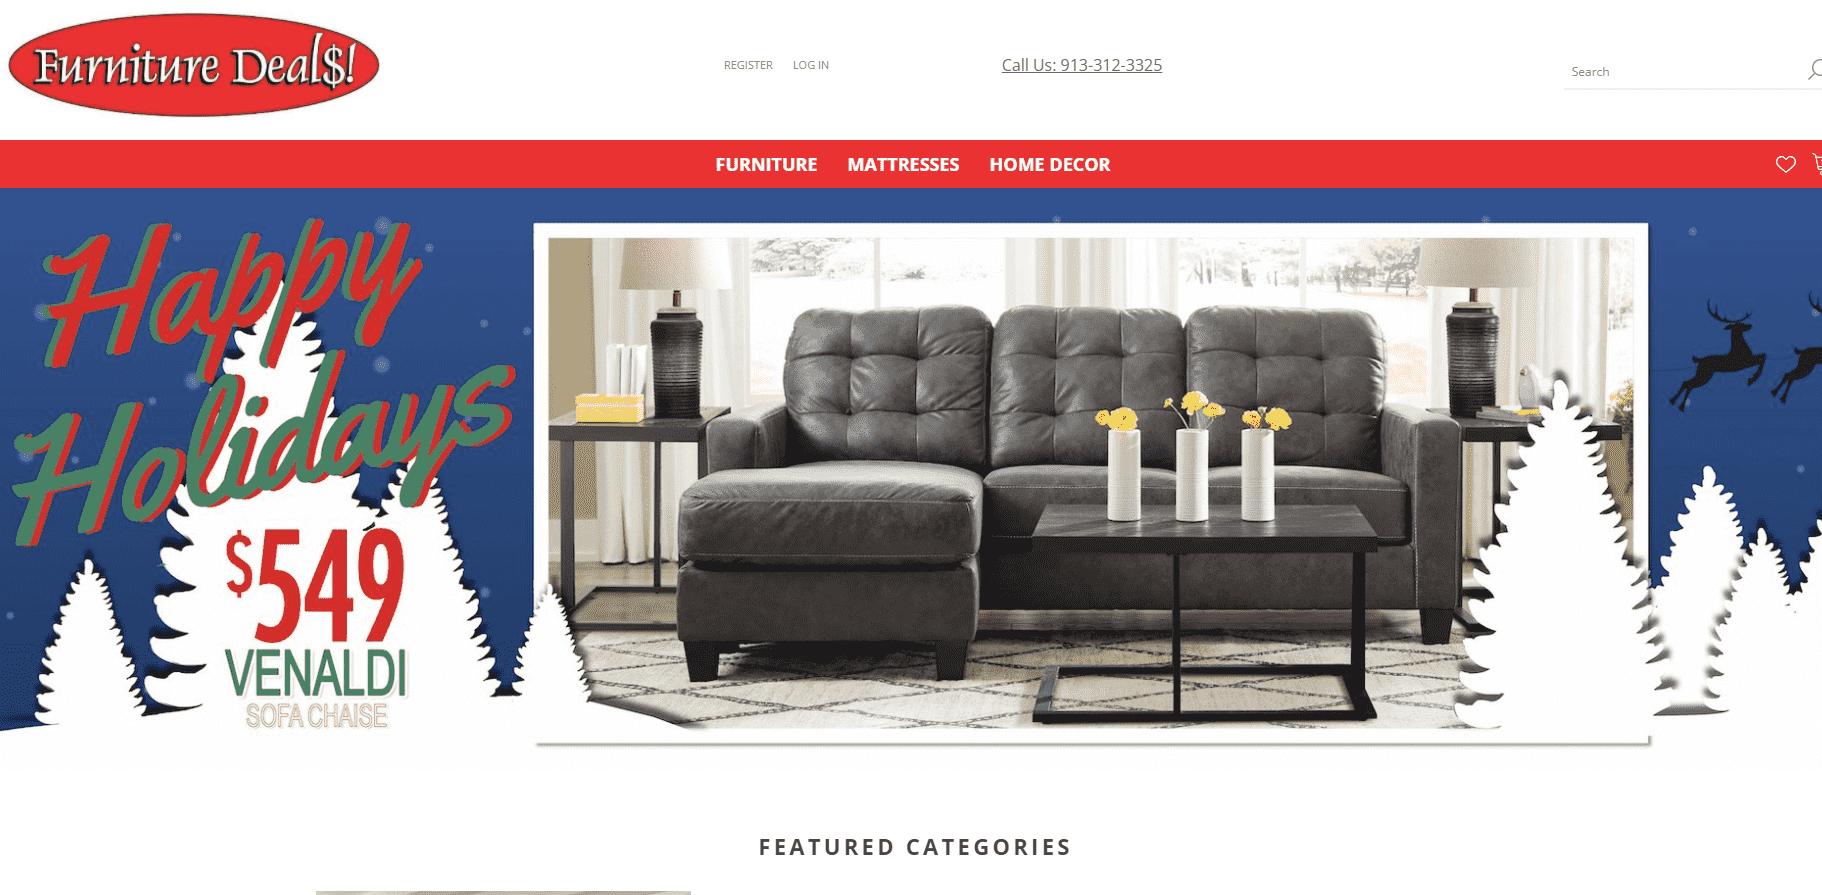 Furniture Deals reviews and complaints